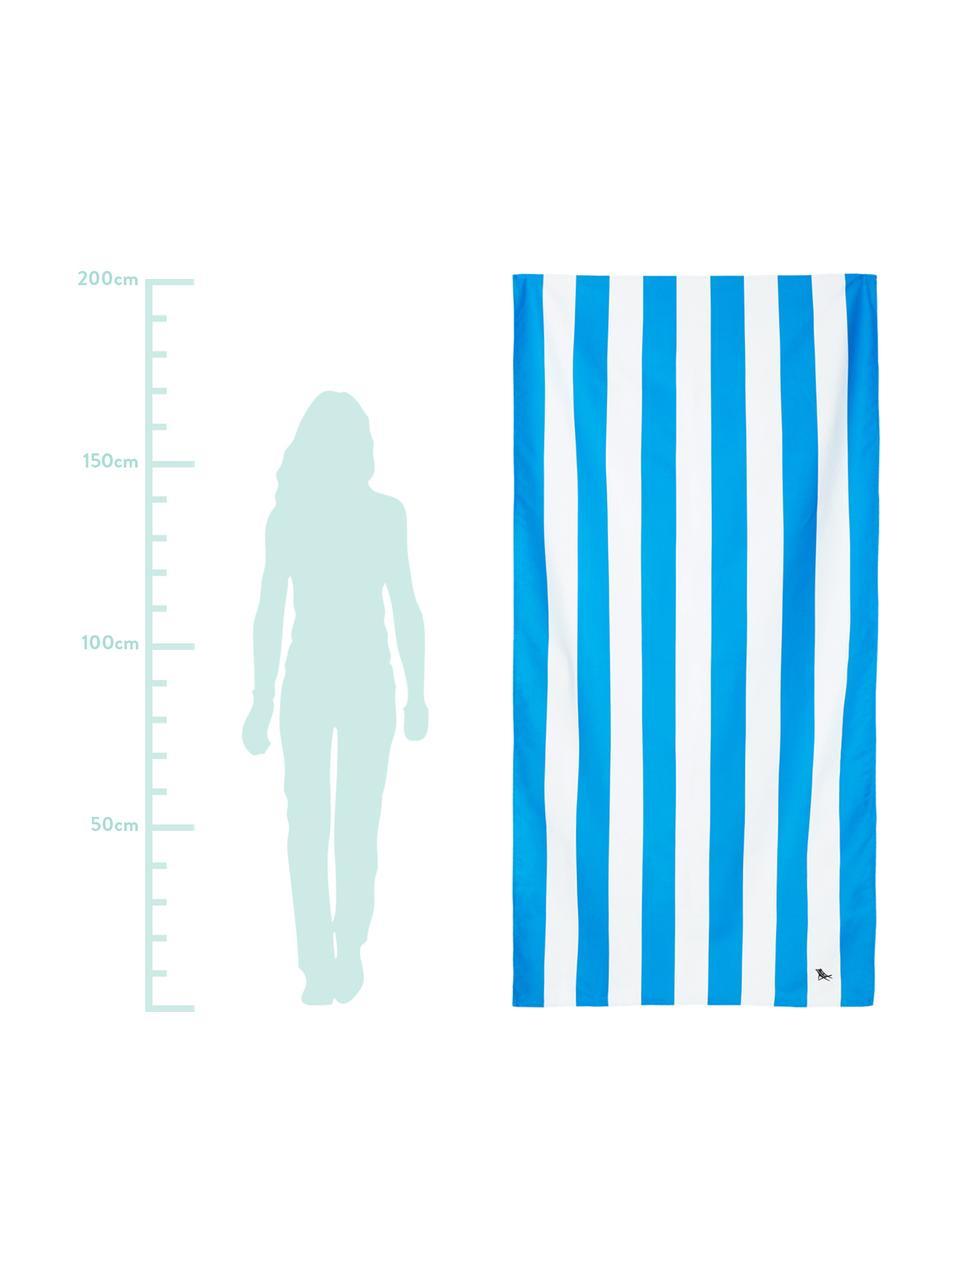 Telo mare in microfibra Cabana, asciugatura rapida, Microfibra (80% poliestere, 20% poliammide), Blu, bianco, Larg. 90 x Lung. 200 cm